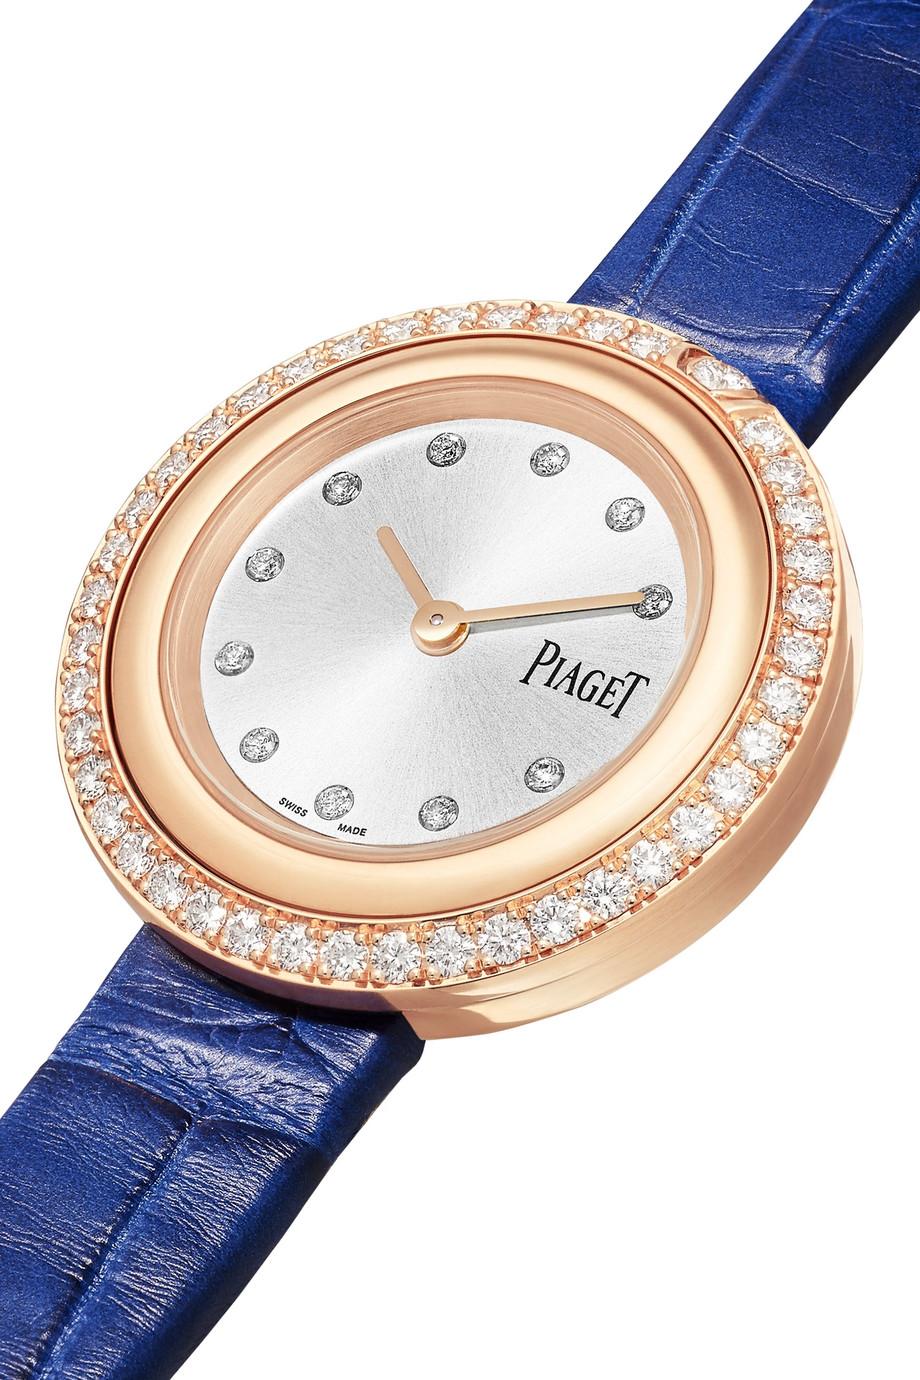 Piaget Possession 29mm 18-karat rose gold, alligator and diamond watch